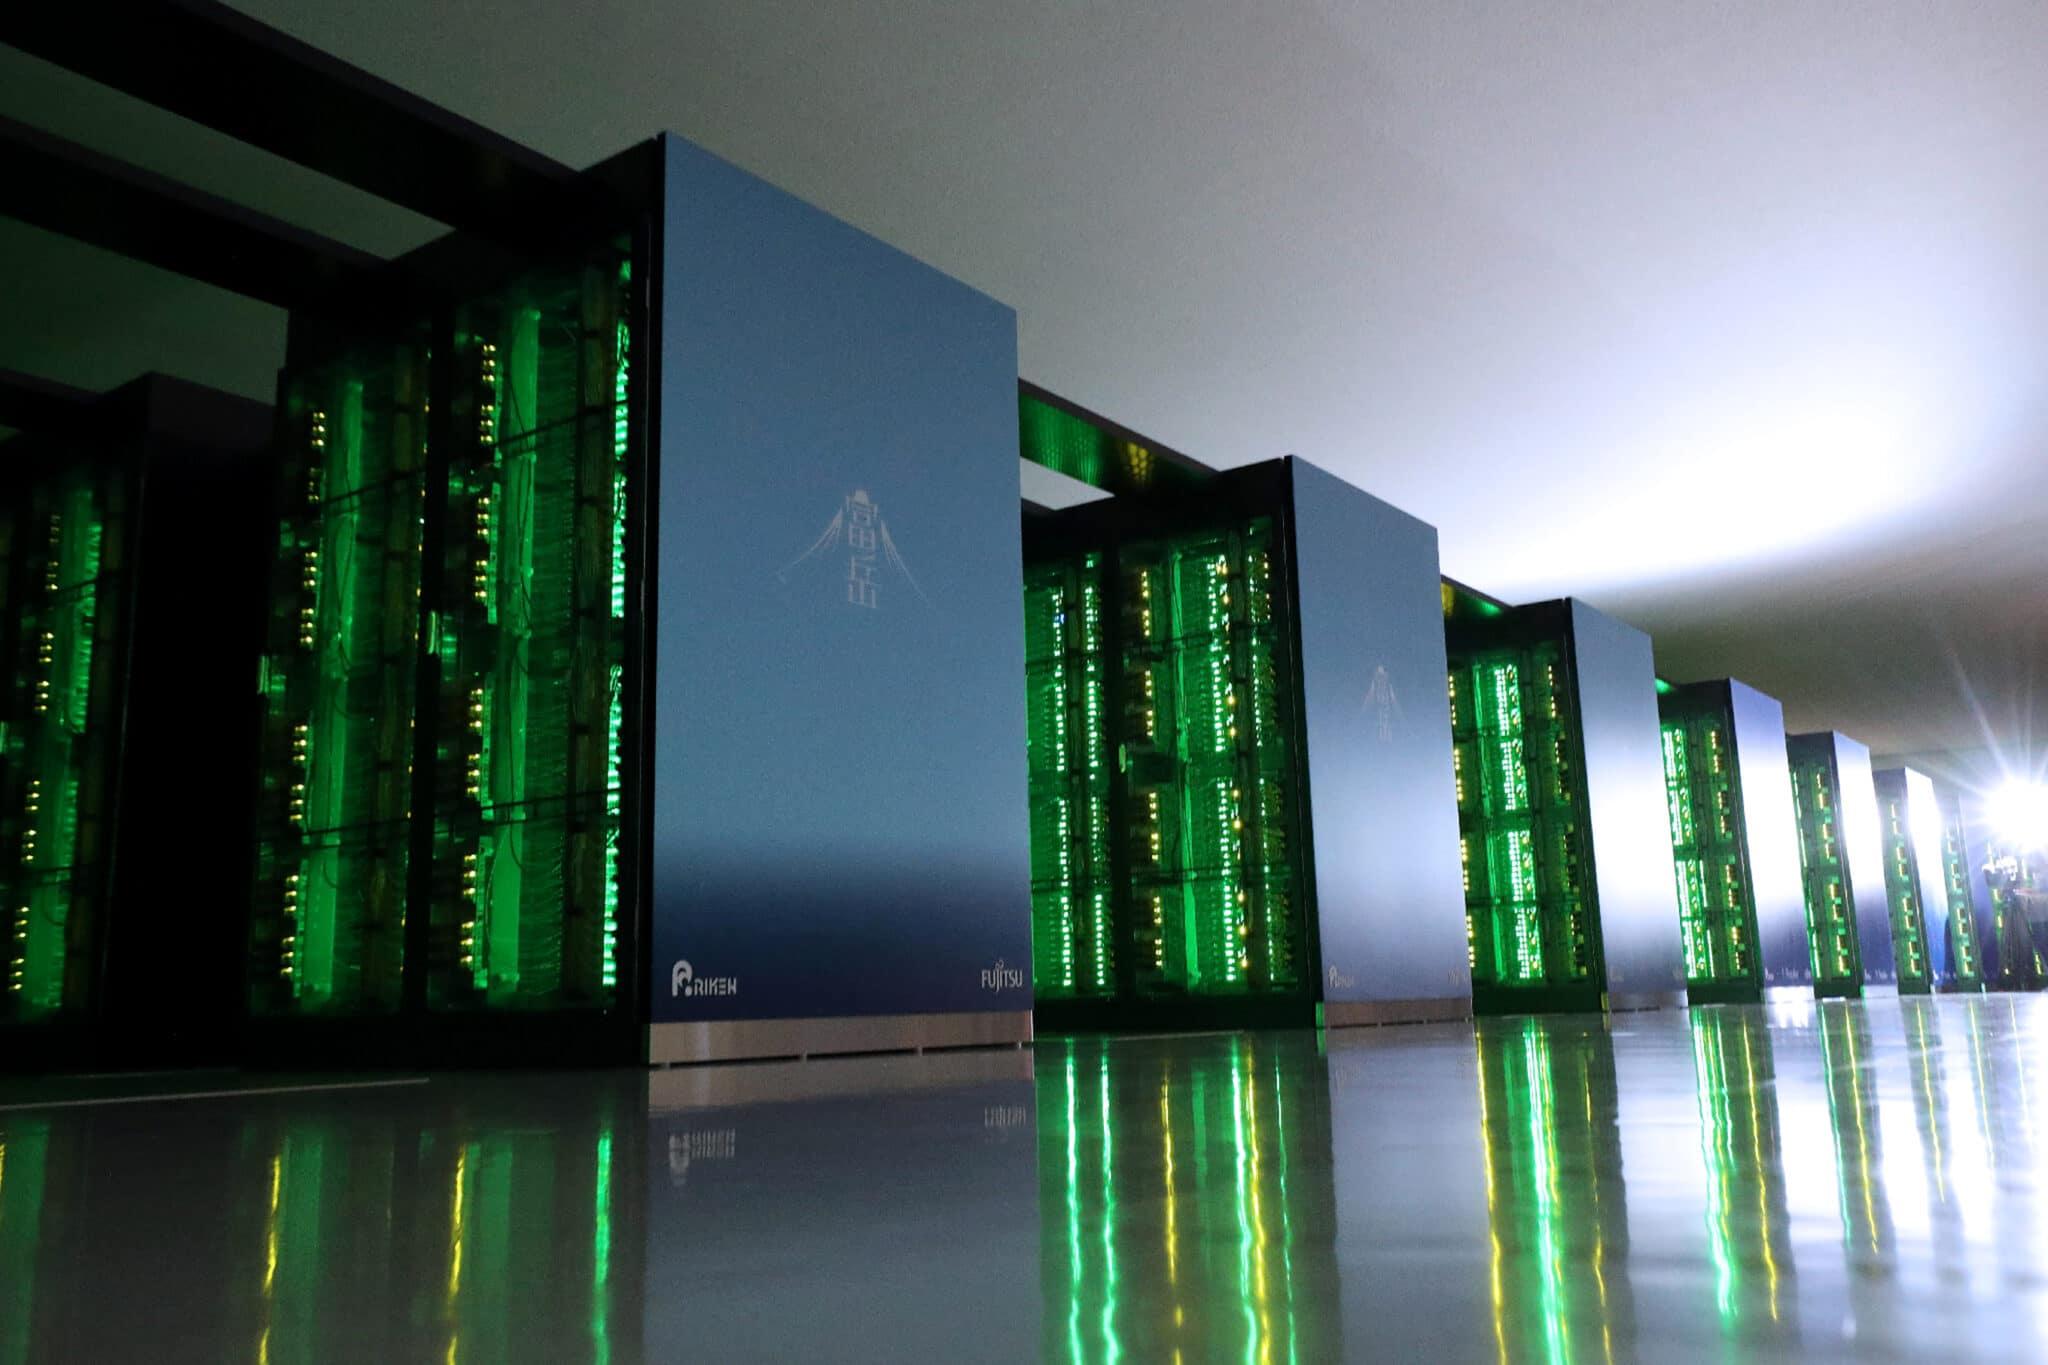 Fugaku supercomputer giapponese